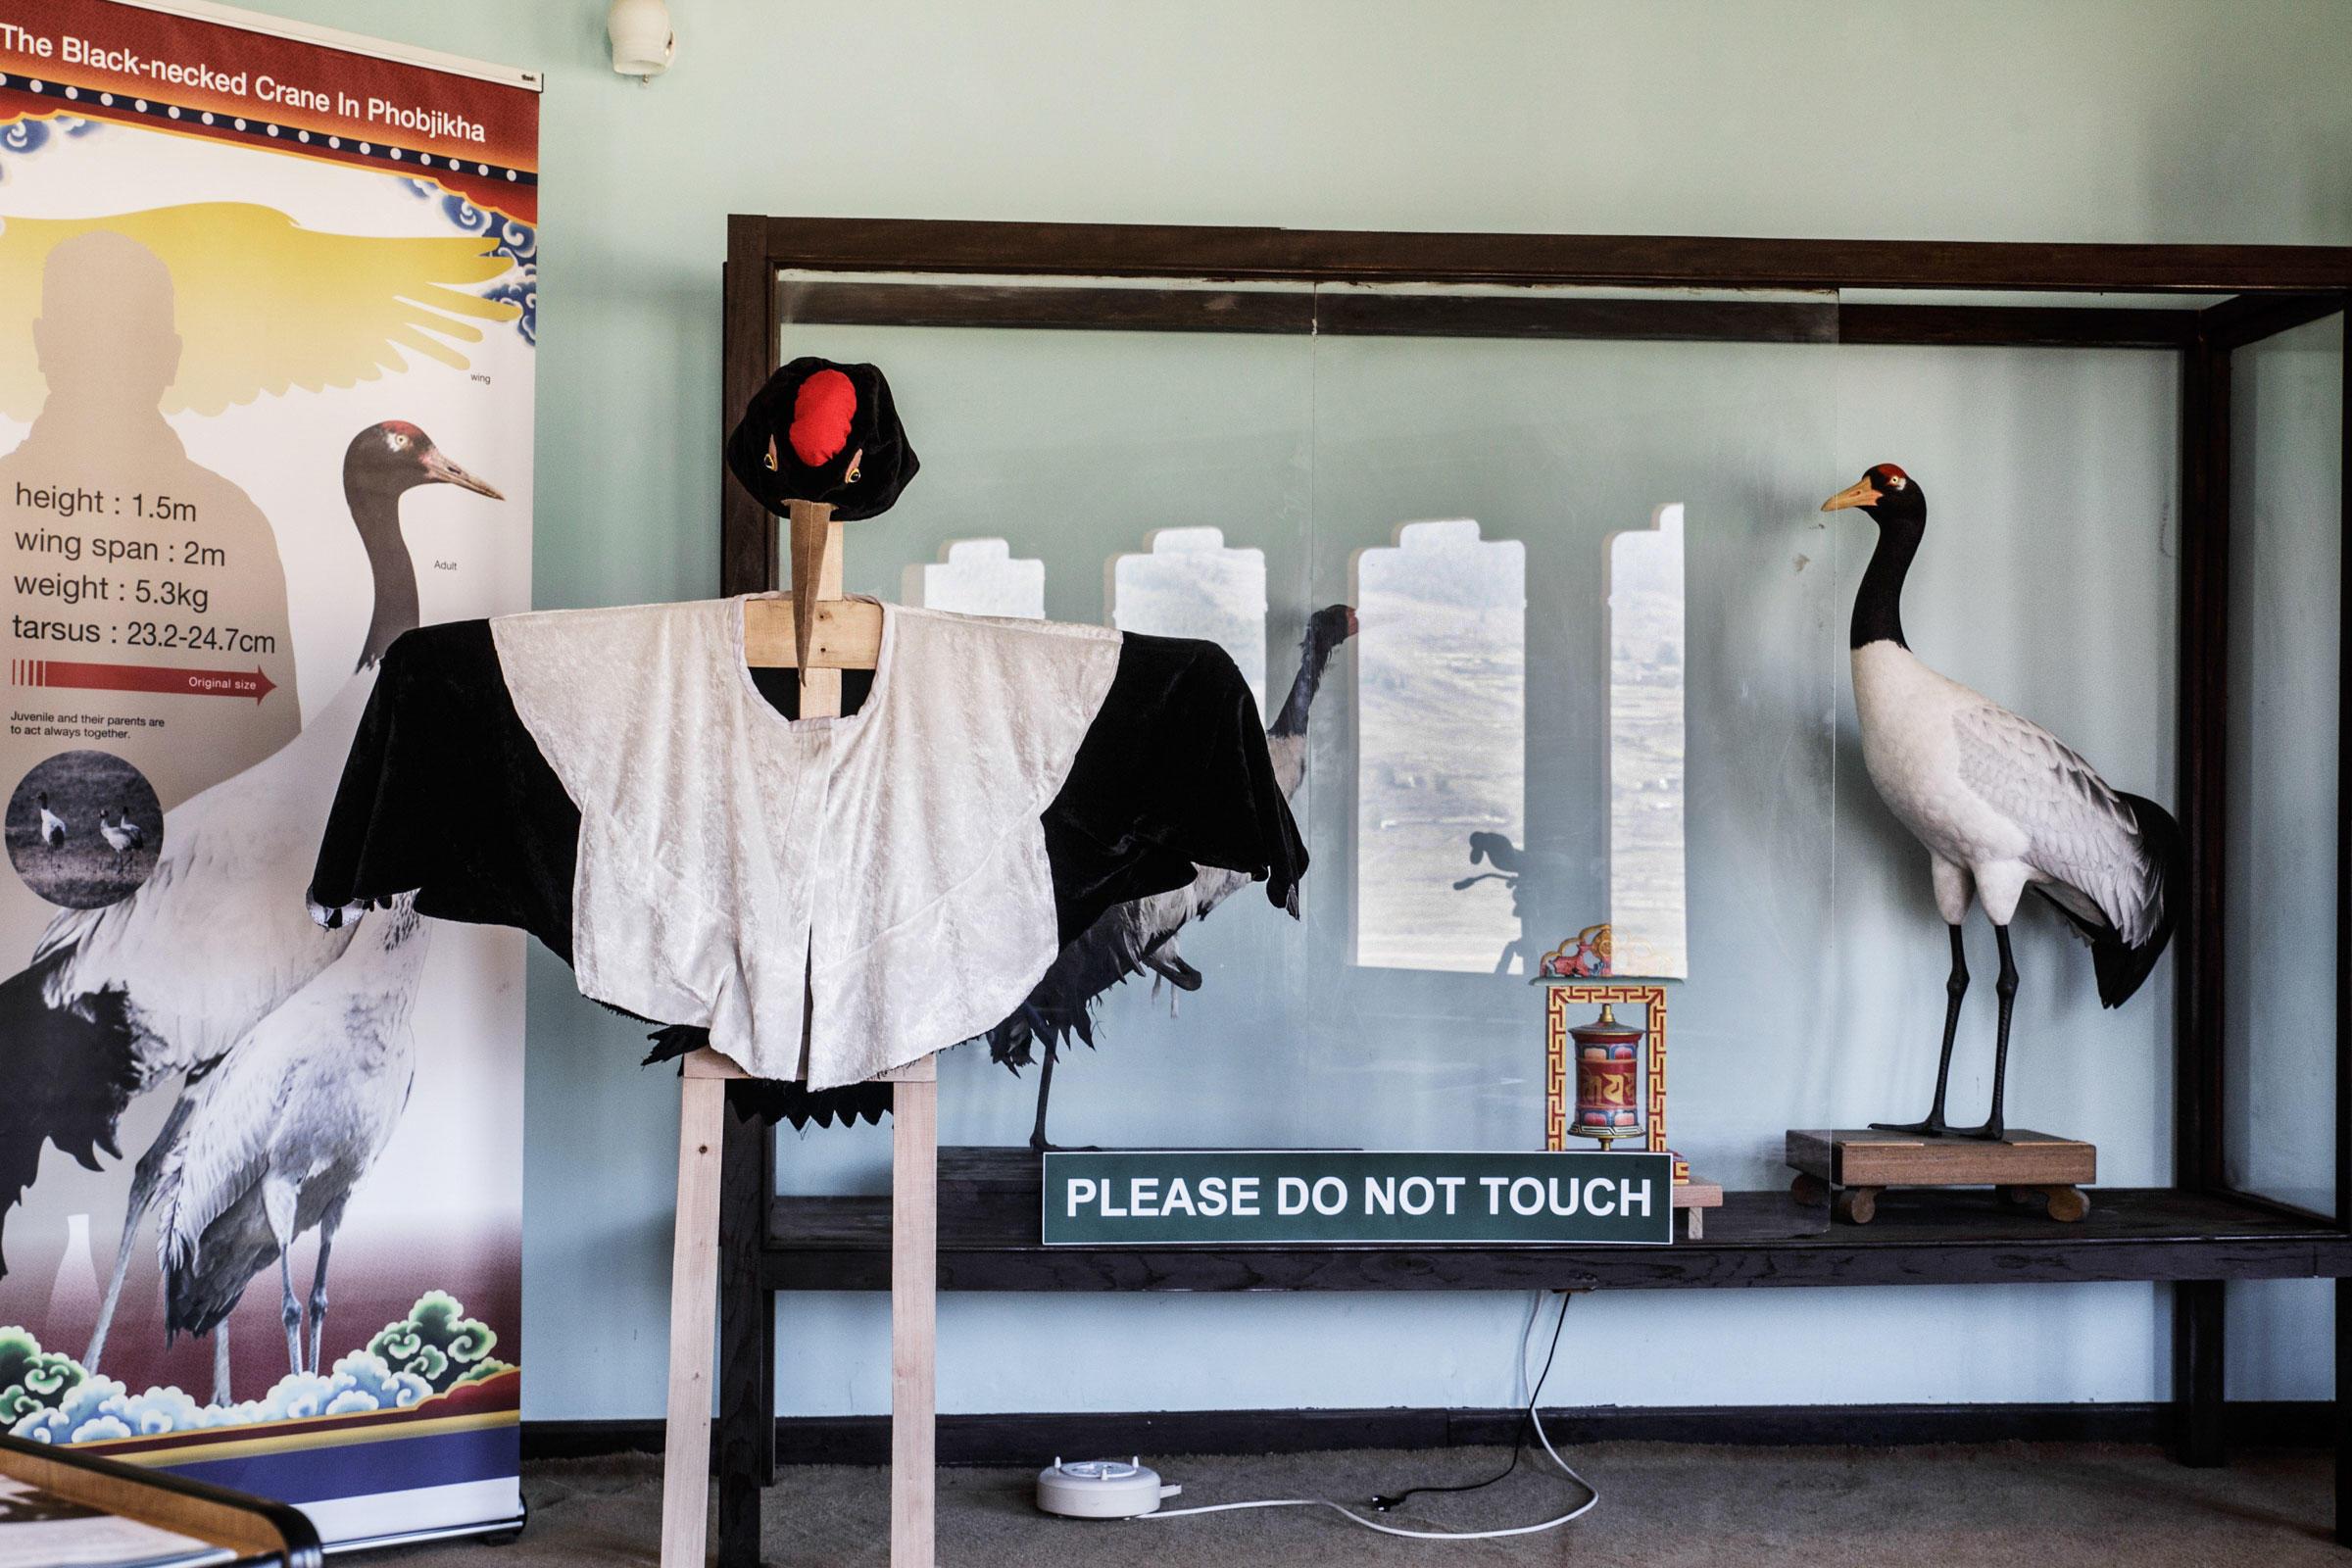 Black-necked Crane information displays at the RSPN center. Ambika Singh